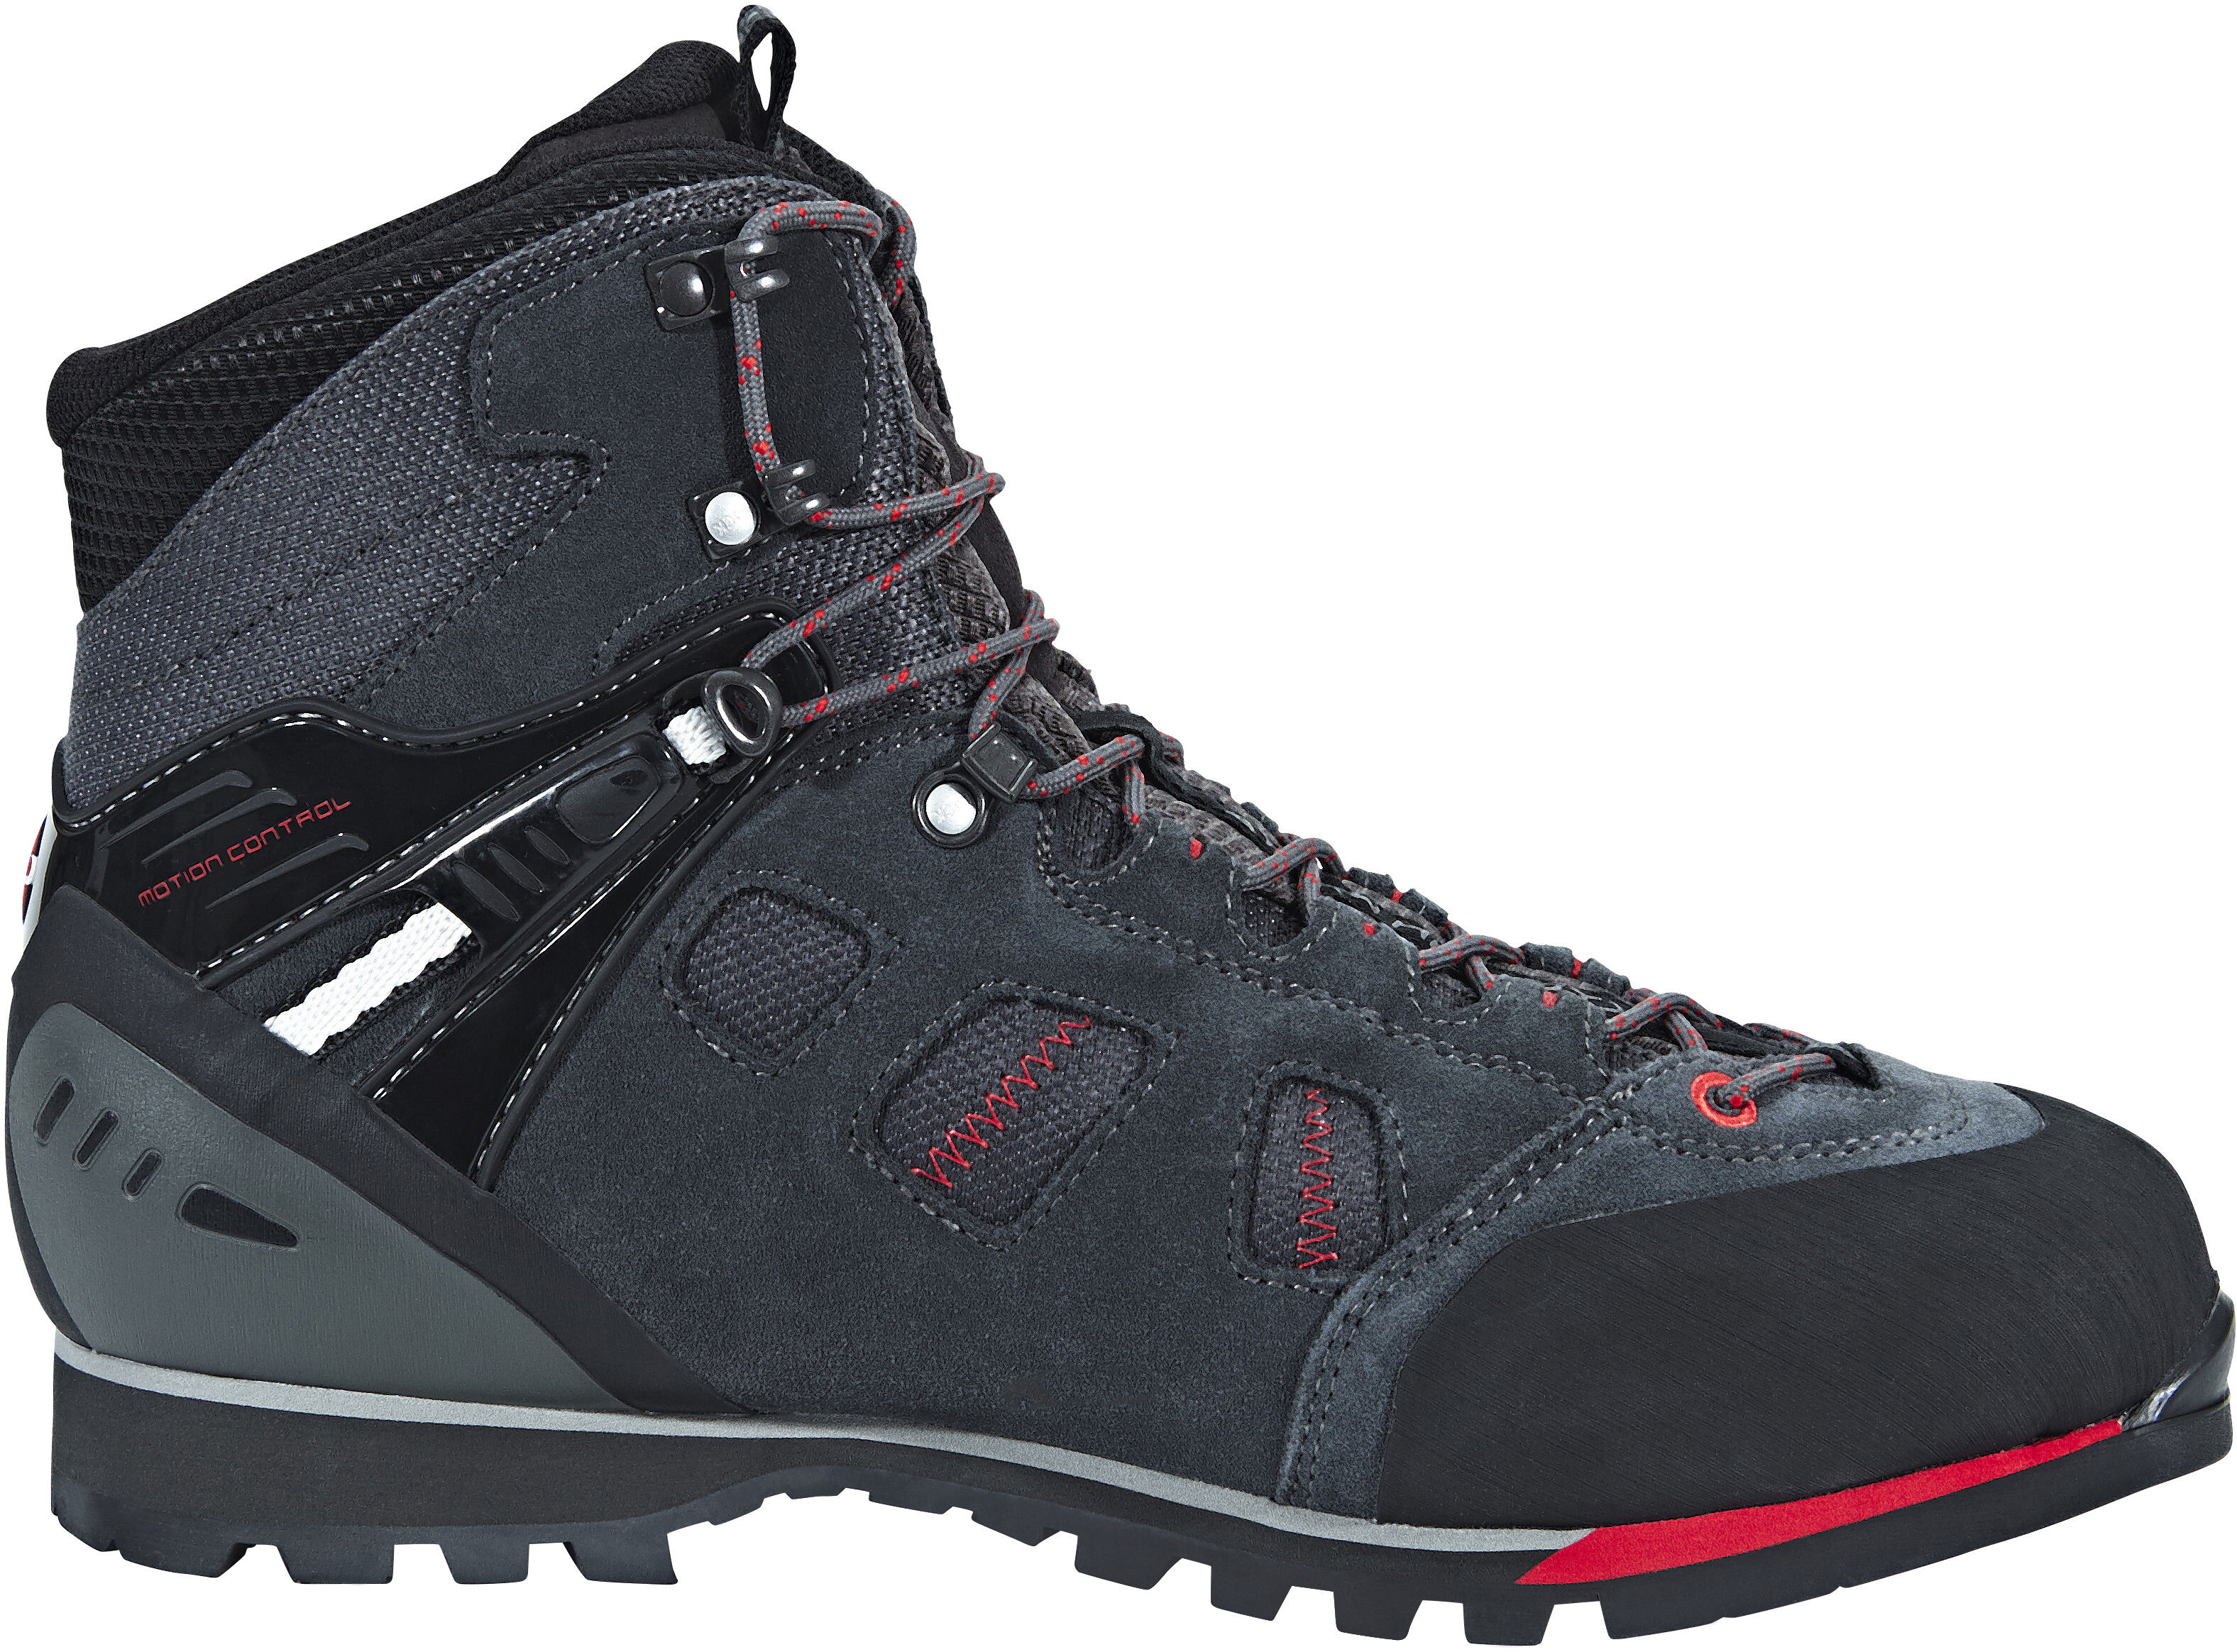 84e42328c23 Mammut Ayako High GTX Shoes Men graphite-inferno